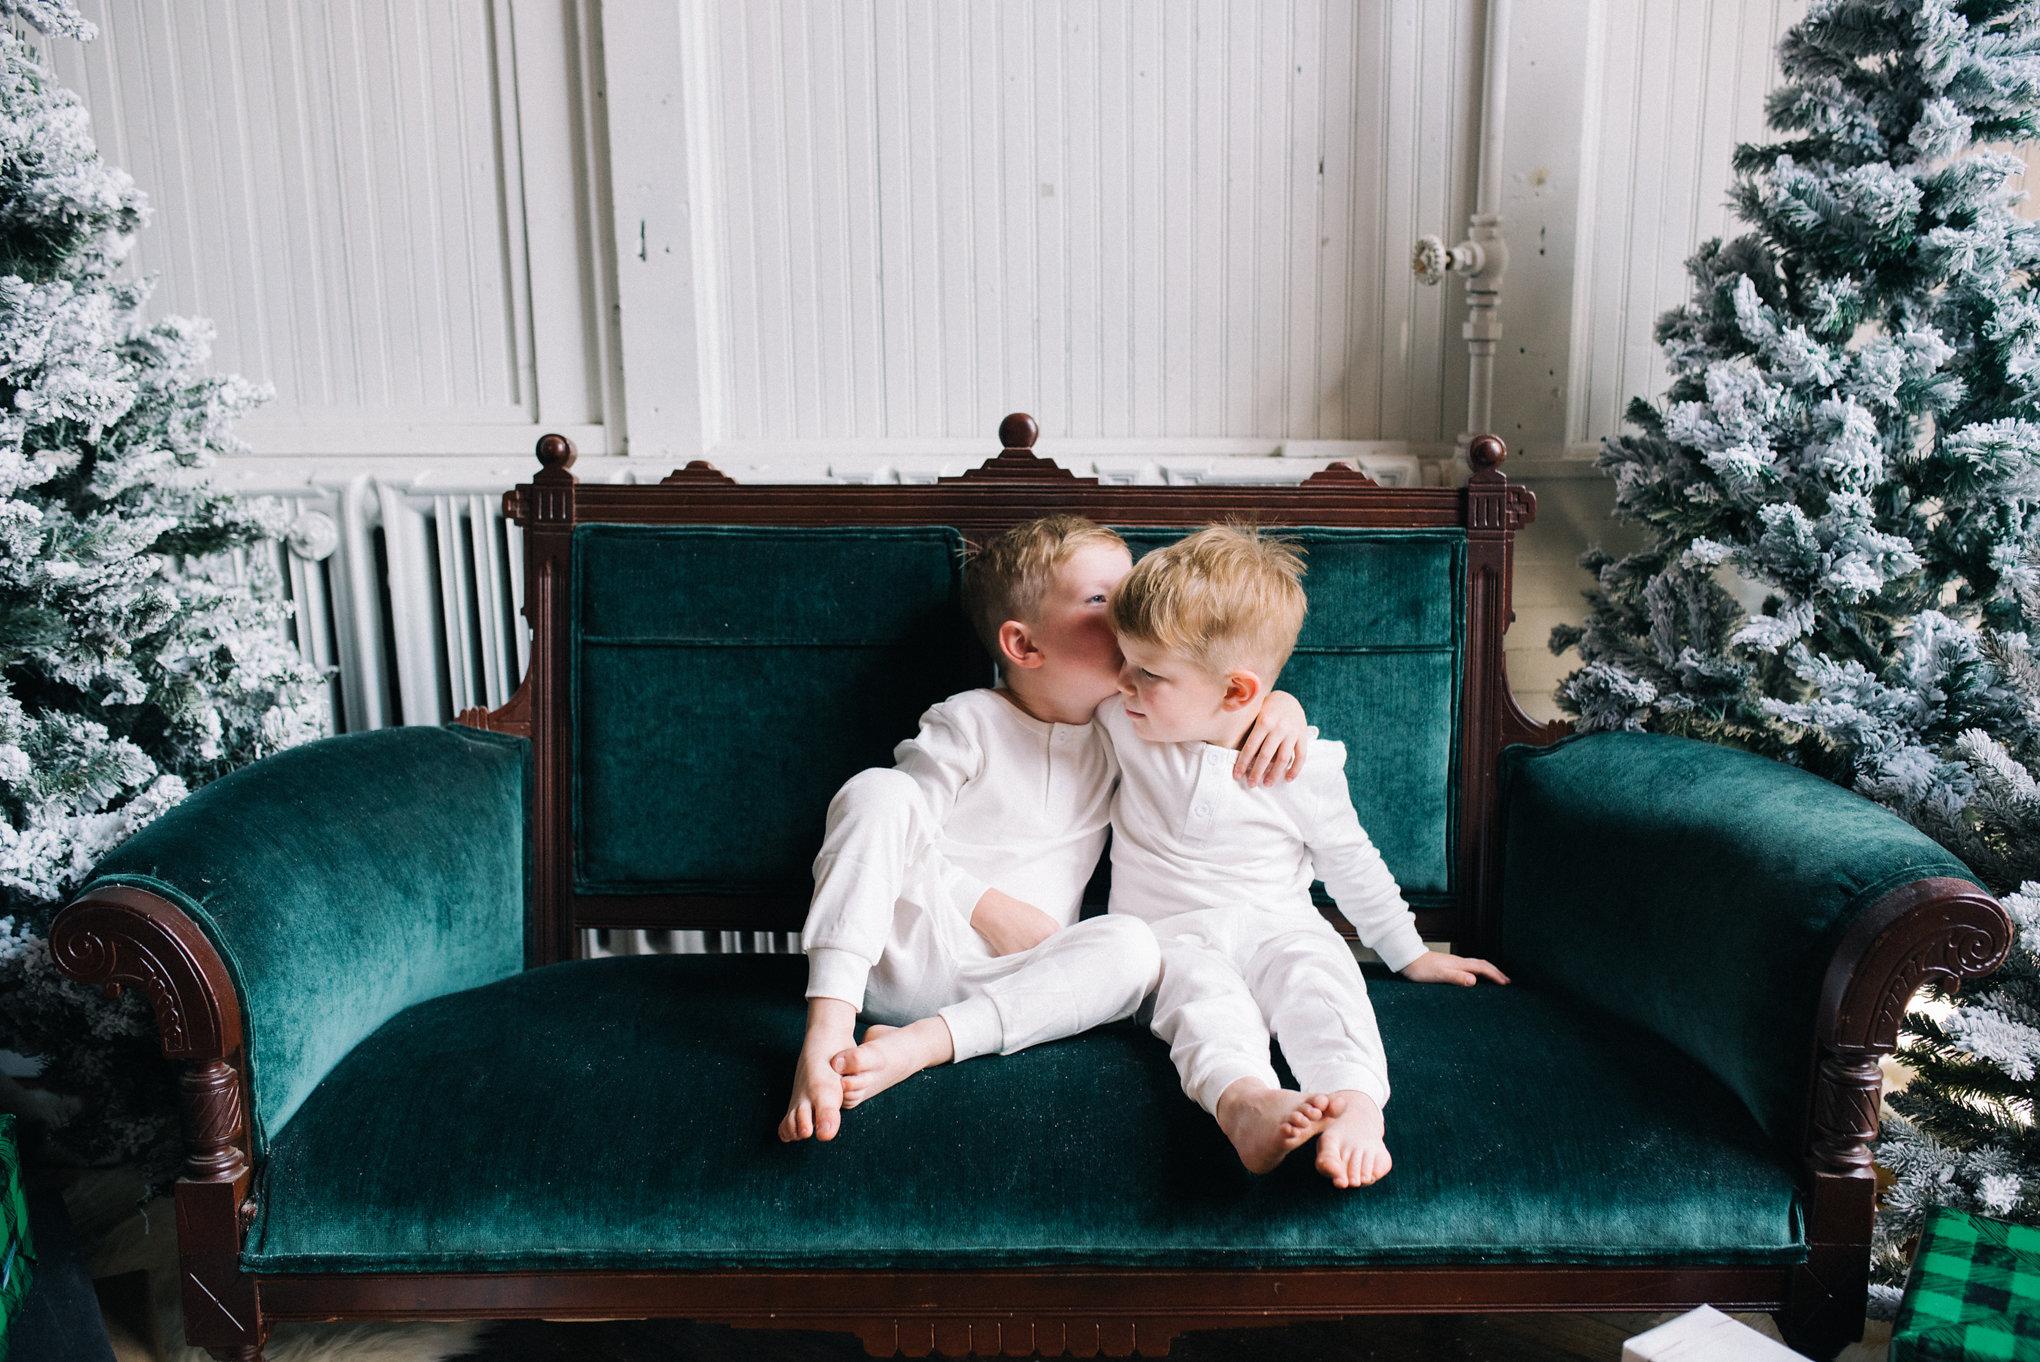 Tonya Espy, Holiday Sets 2018